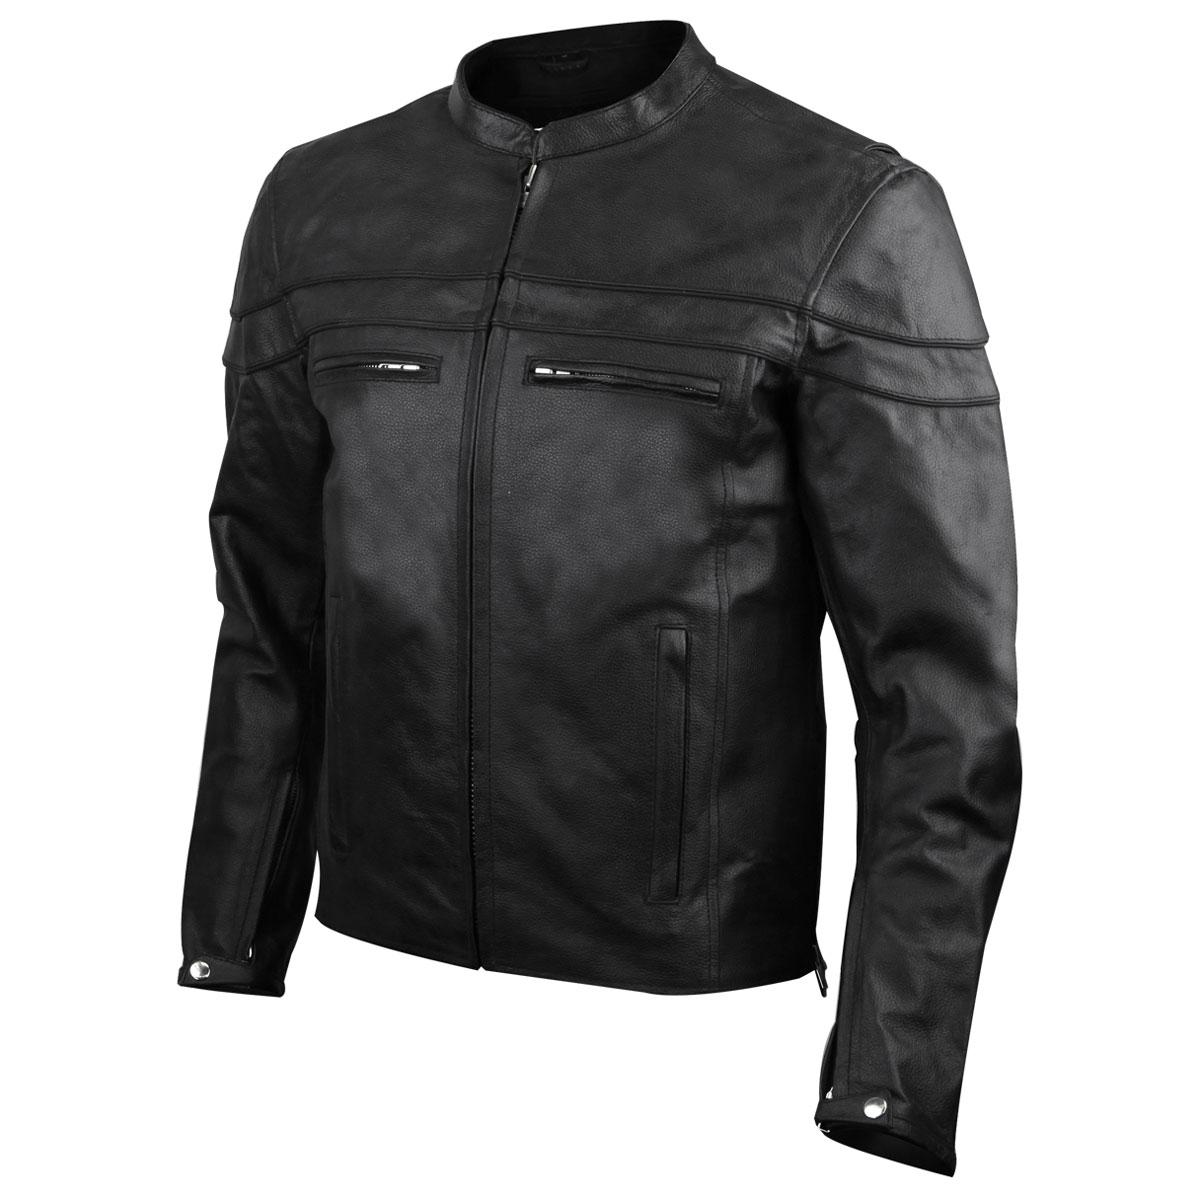 Vance Leathers Men's Racer Black Leather Jacket